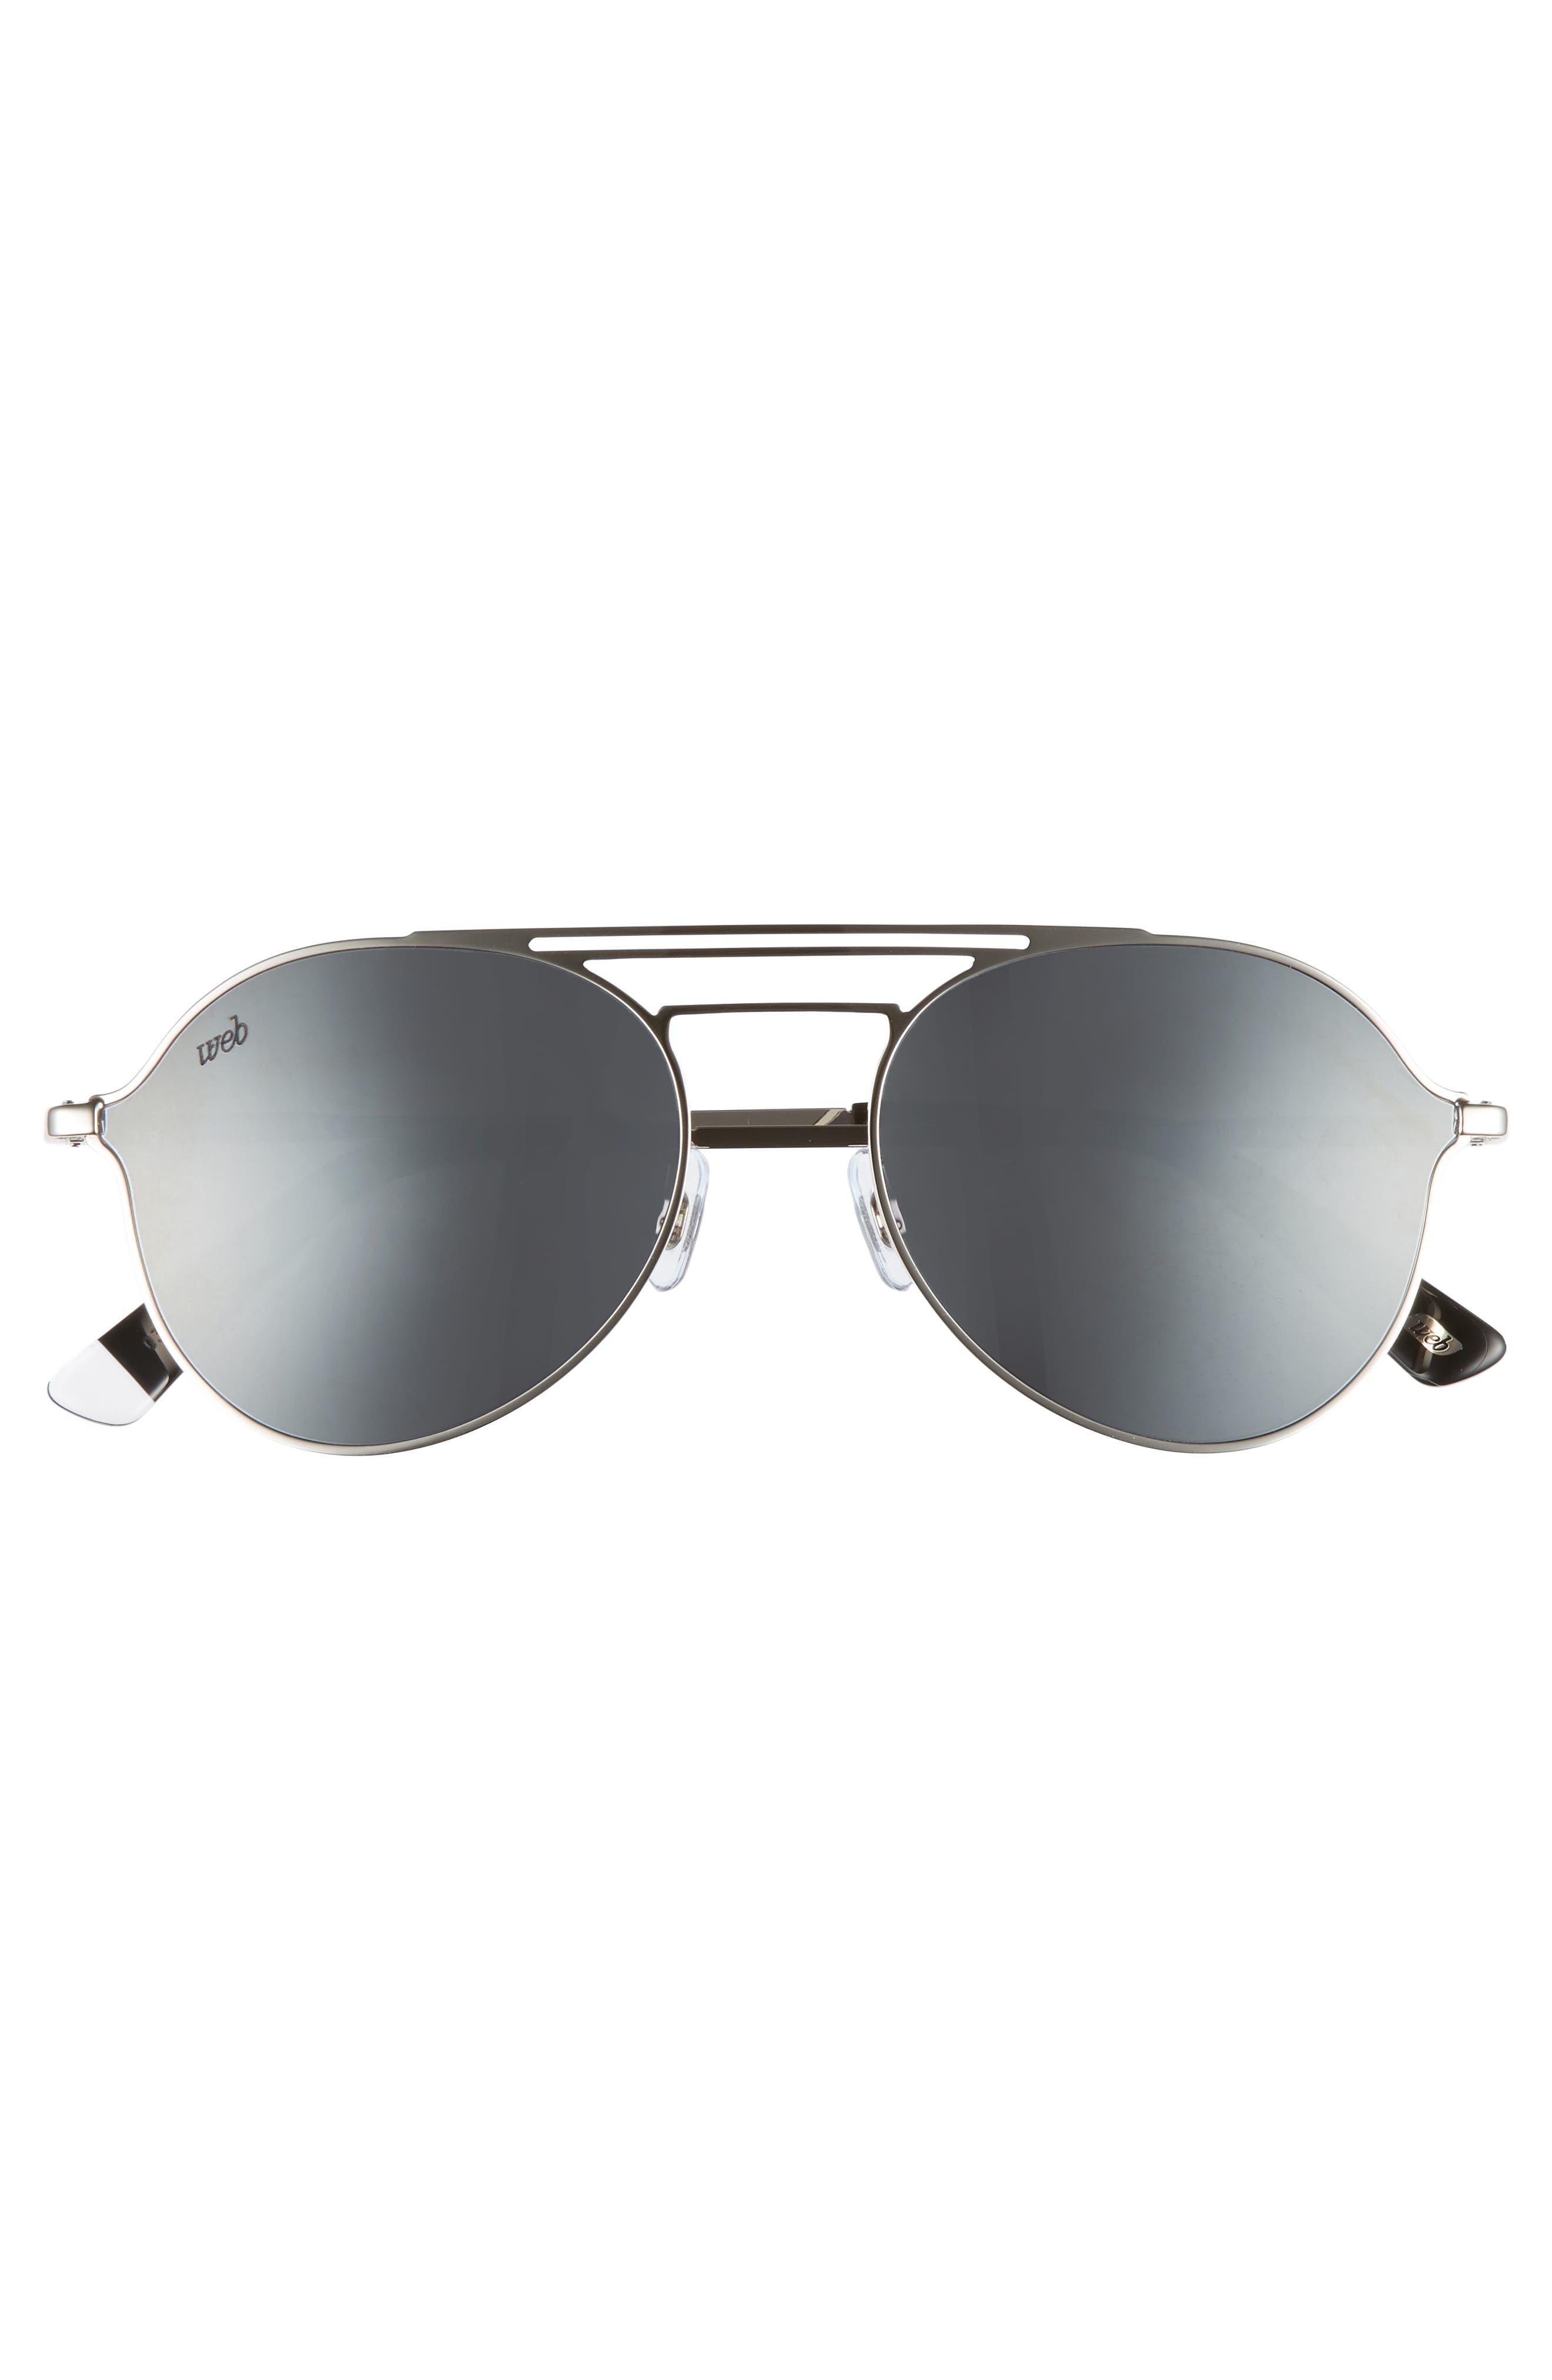 56mm Aviator Sunglasses,                             Alternate thumbnail 3, color,                             Shiny Palladium/ Smoke Mirror